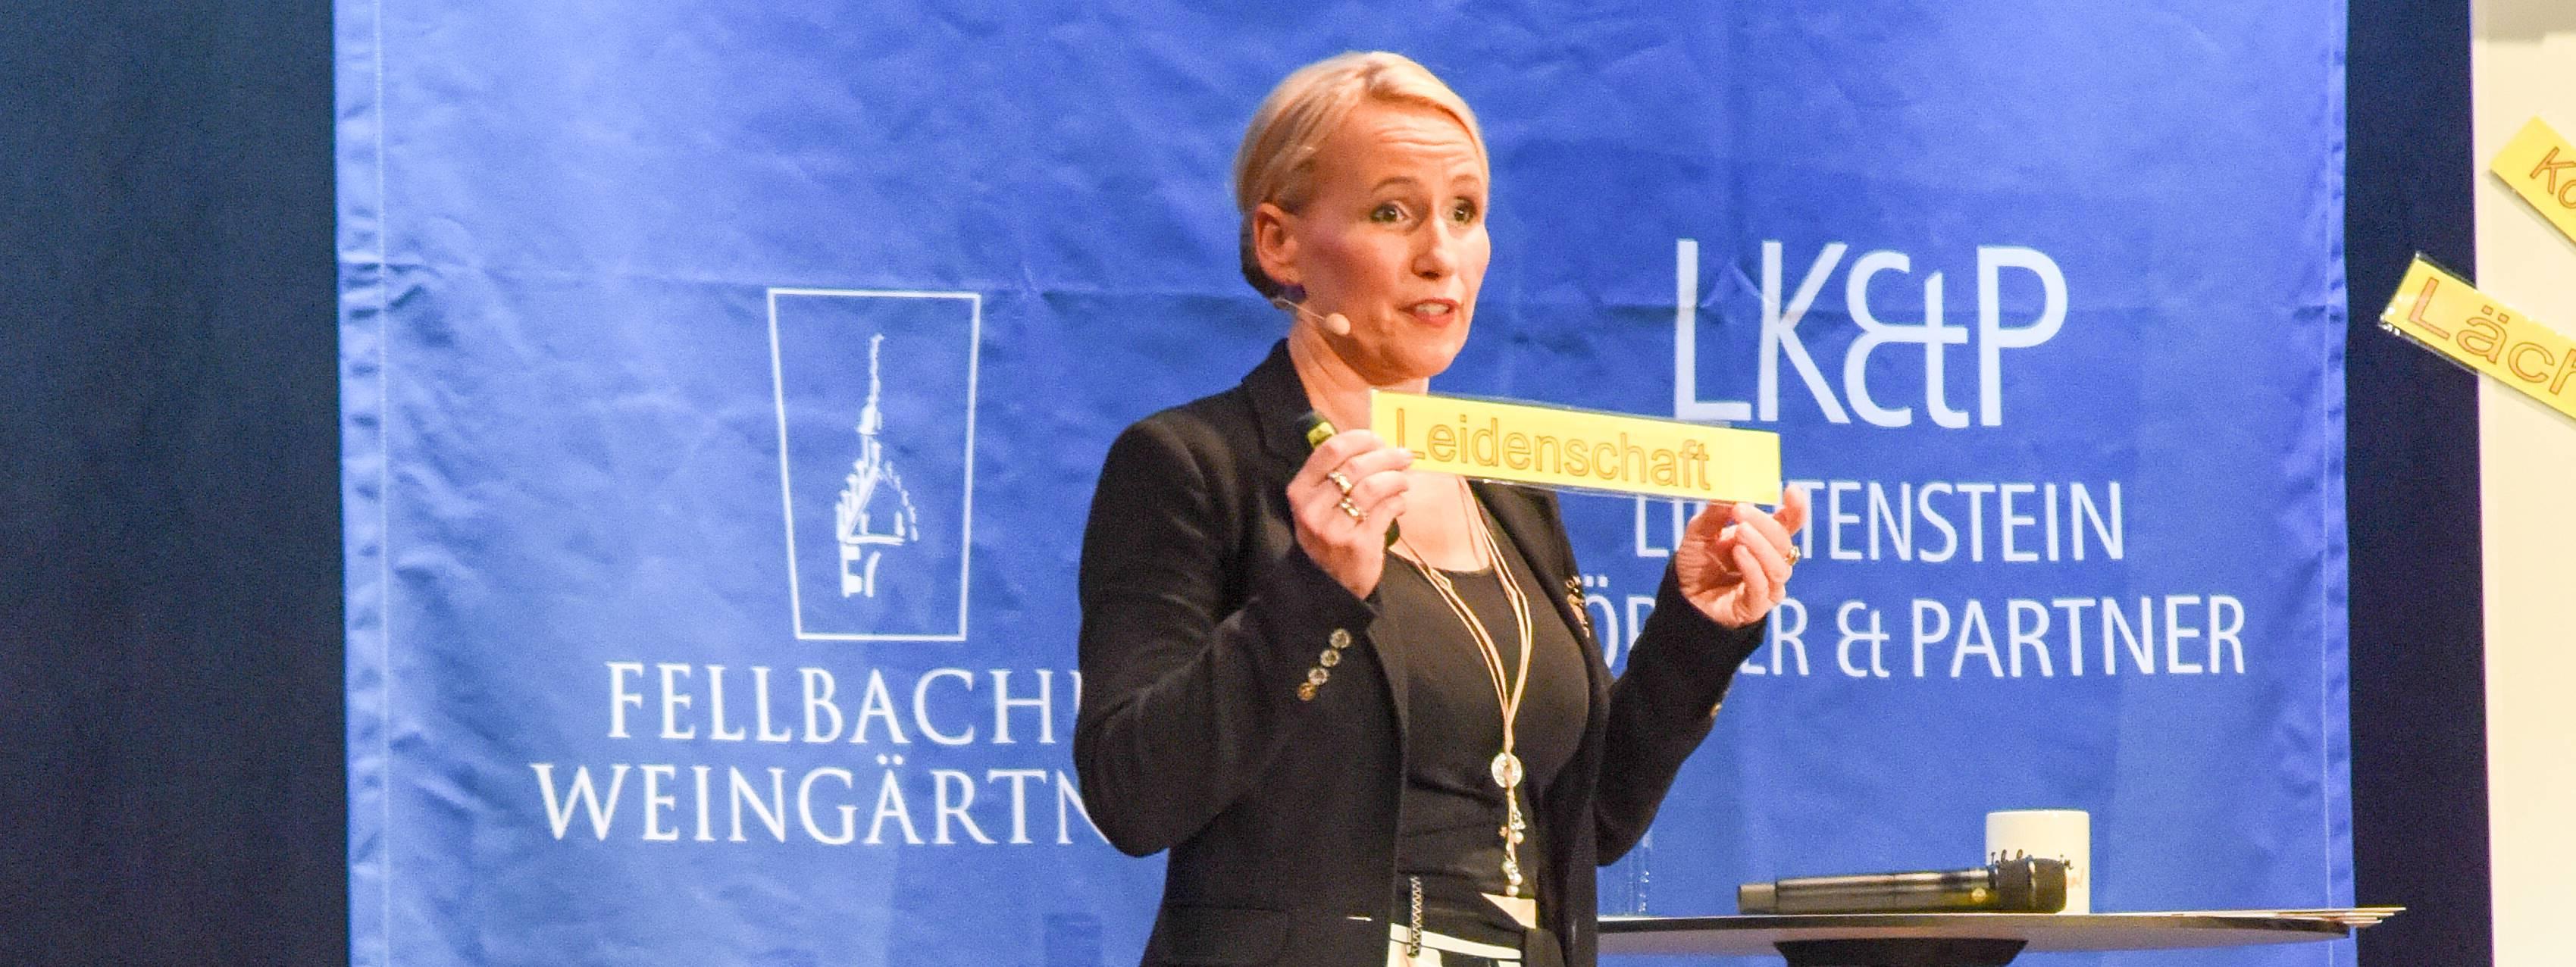 WIRKstoff Selbstmarketing Kundenbegeisterung Charisma Carolin Amerling Köln Bergisch Glabach